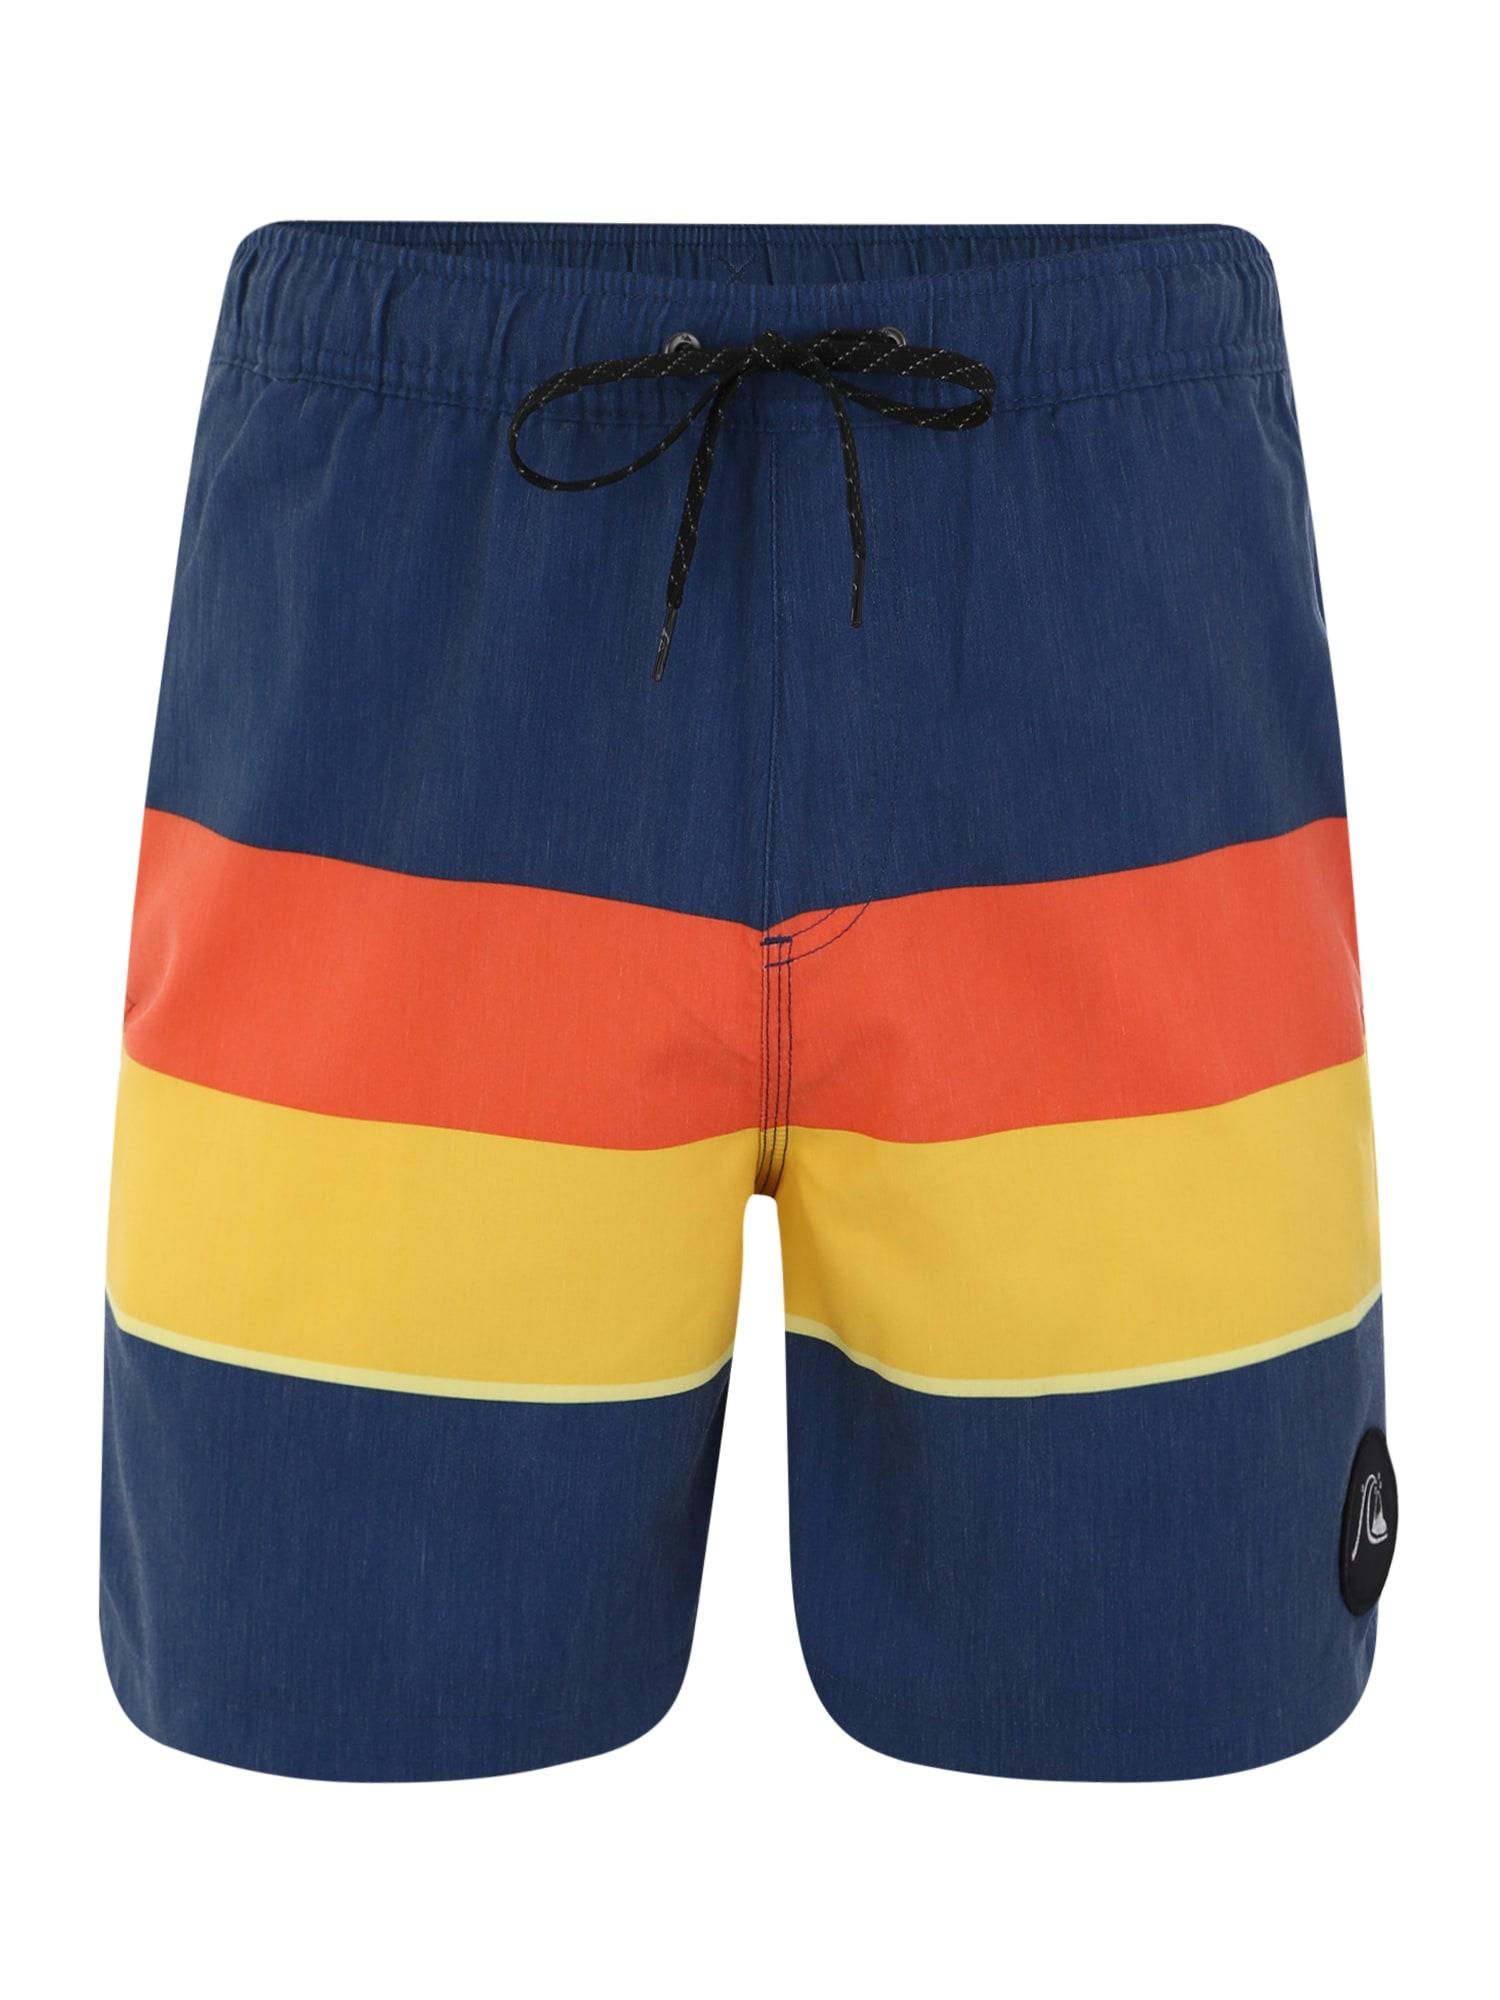 Plavecké šortky SEASONSVOL17 M JAMV tmavě modrá žlutá oranžová QUIKSILVER